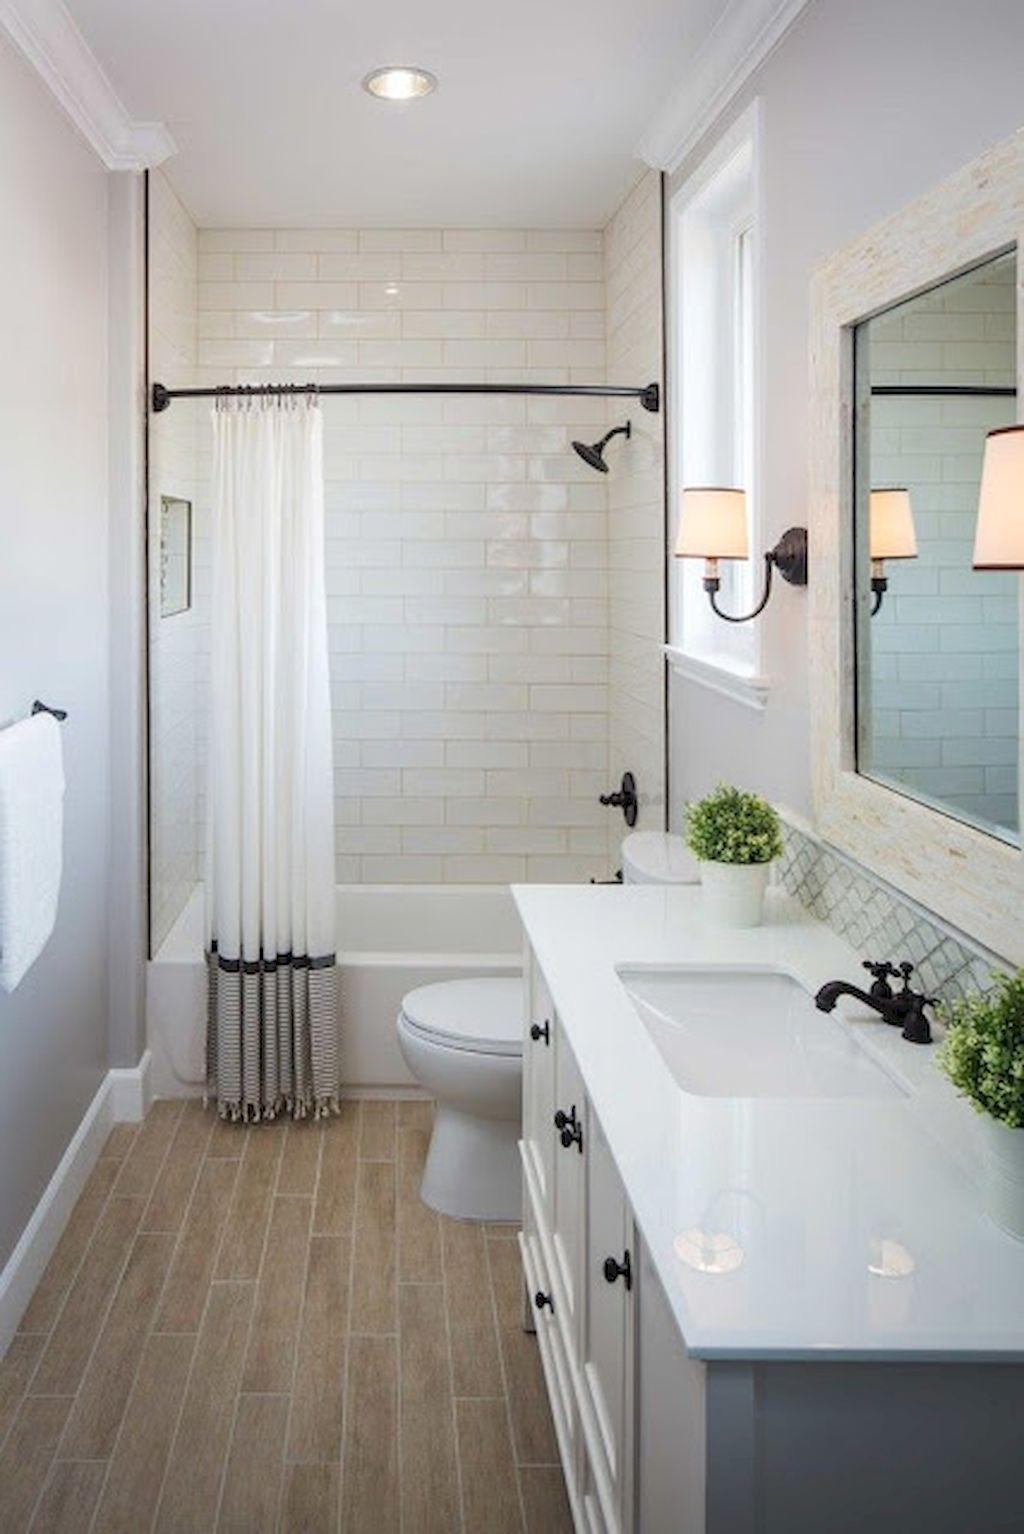 Apartment Bathroom Designs Fascinating 40 Graceful Tiny Apartment Bathroom Remodel Ideas On A Budget Inspiration